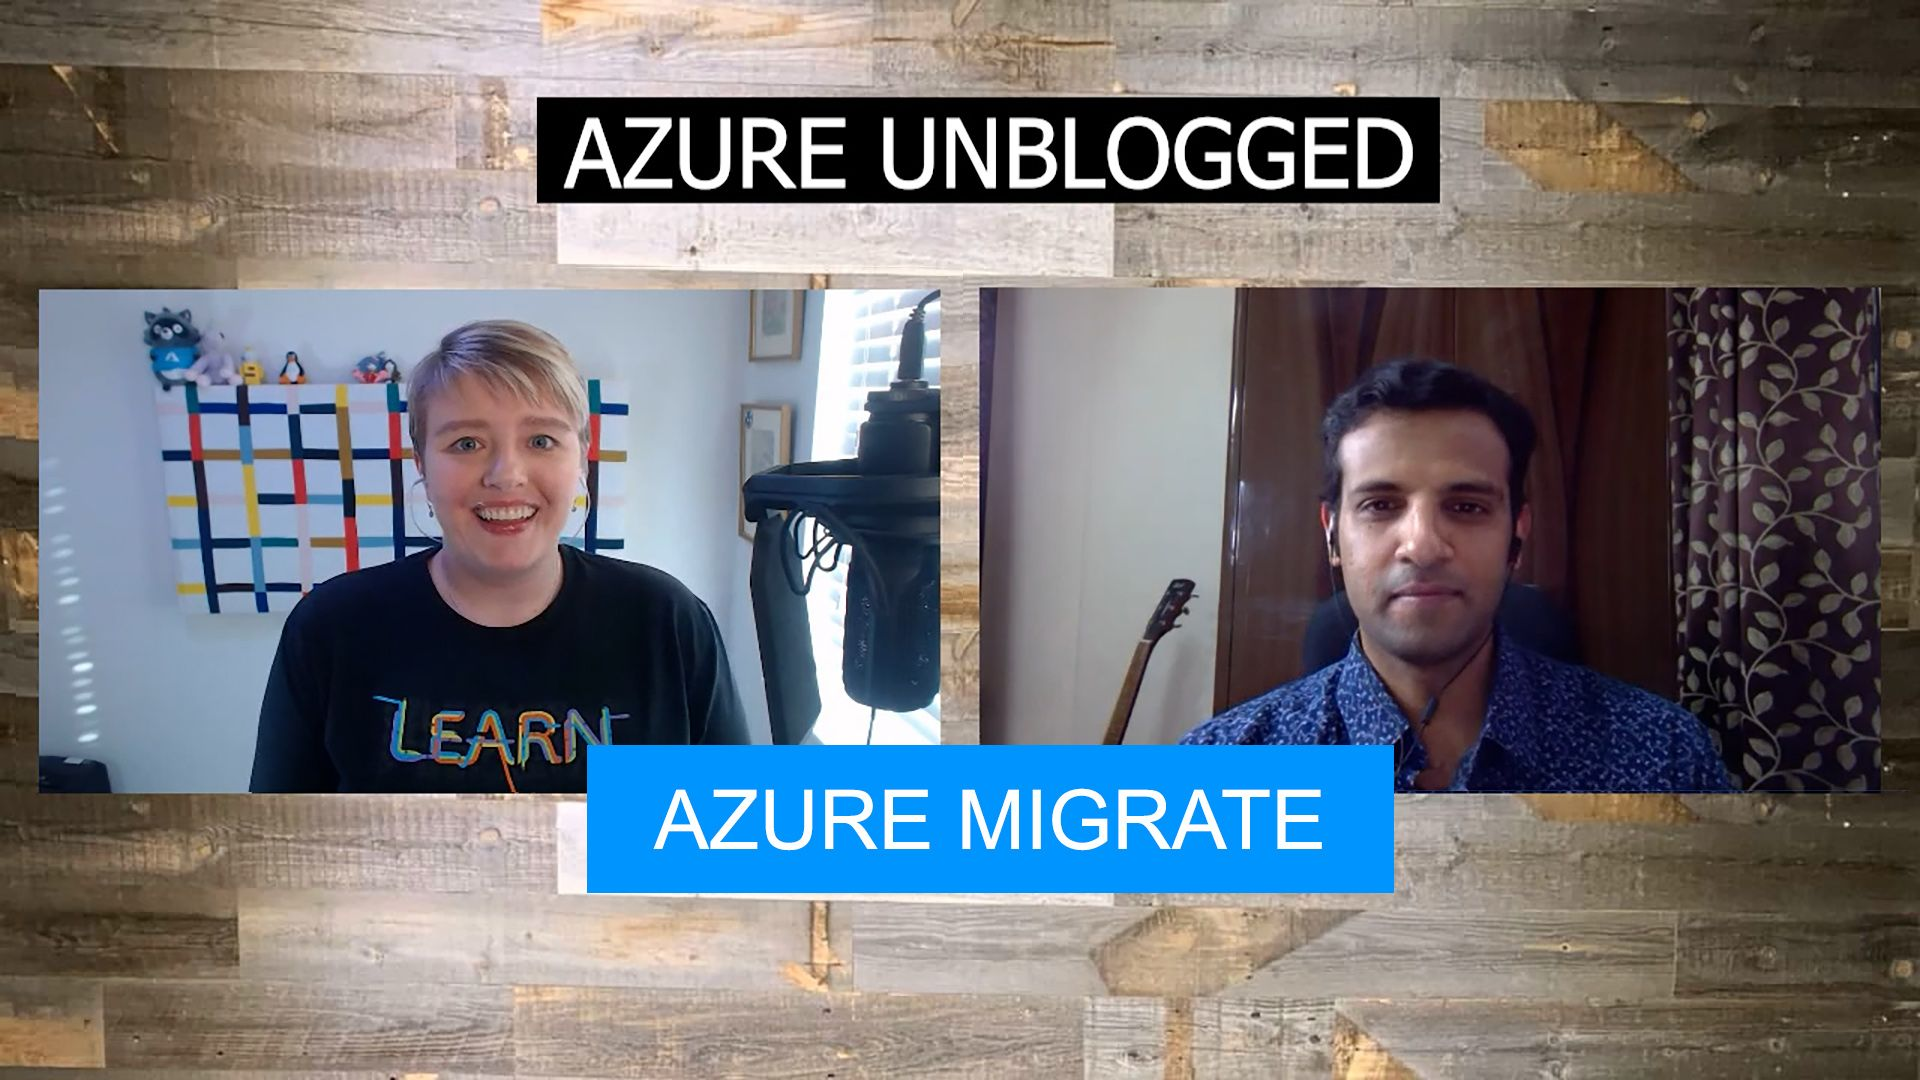 Azure Unblogged - Azure Migrate